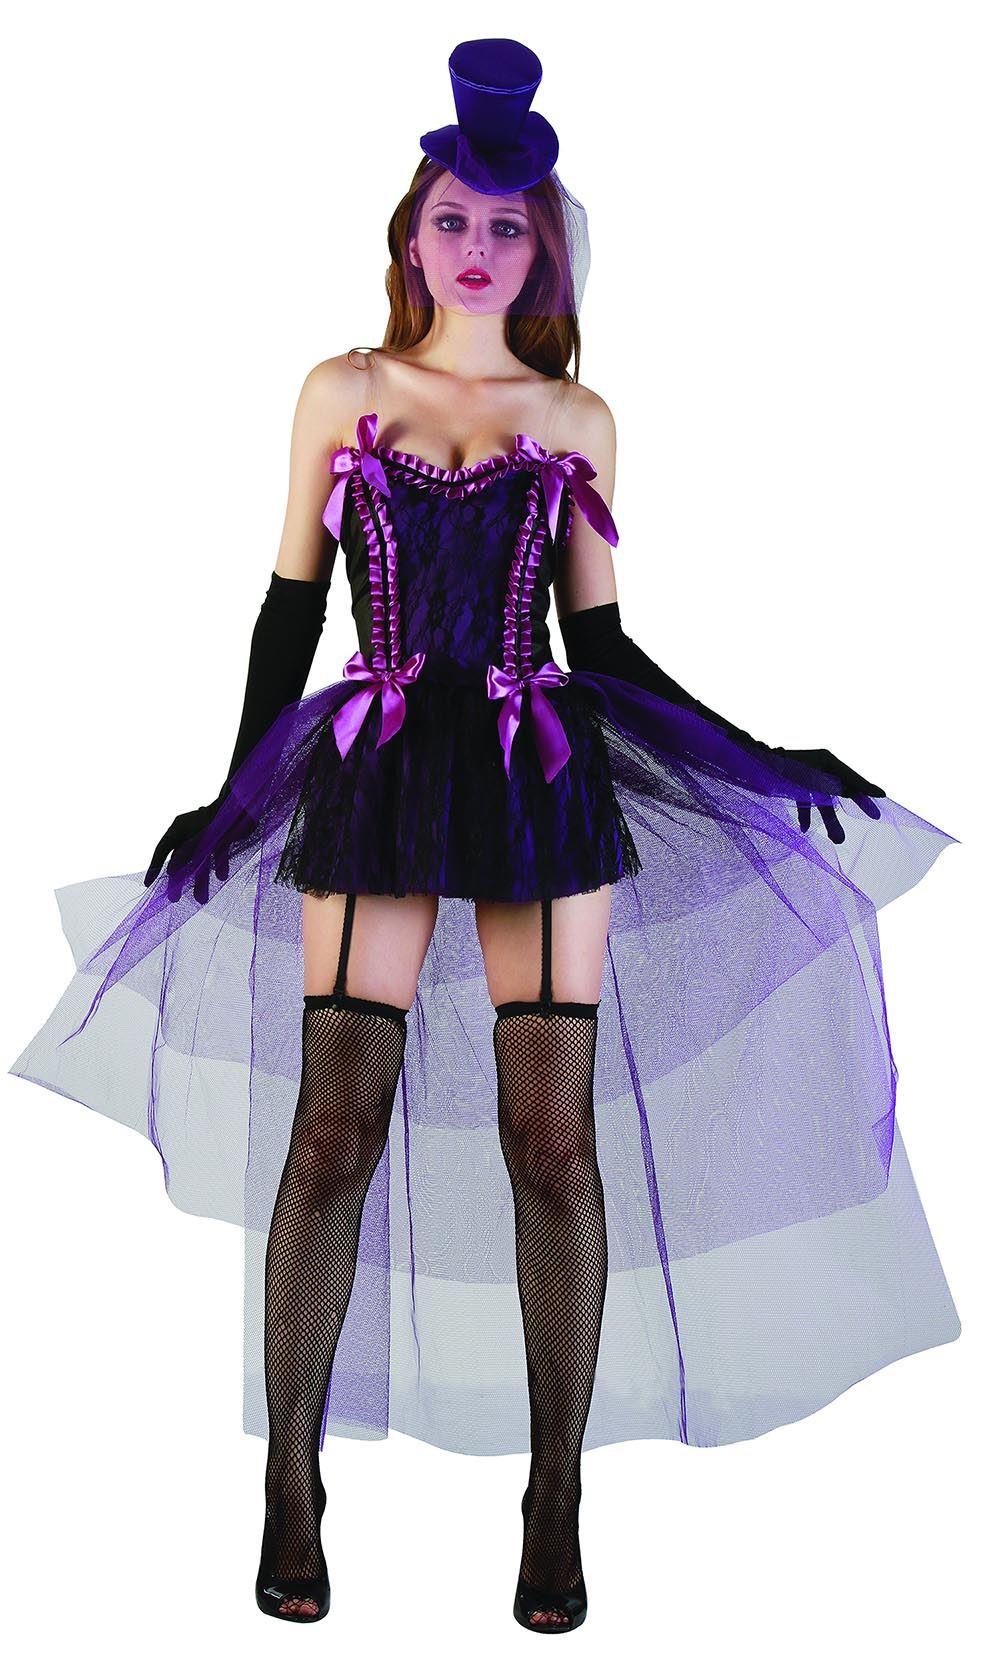 ADULT LADIES WOMEN STORYBOOK FESTIVAL HEN PARTIES COSTUME FANCY DRESS OUTFITS | eBay